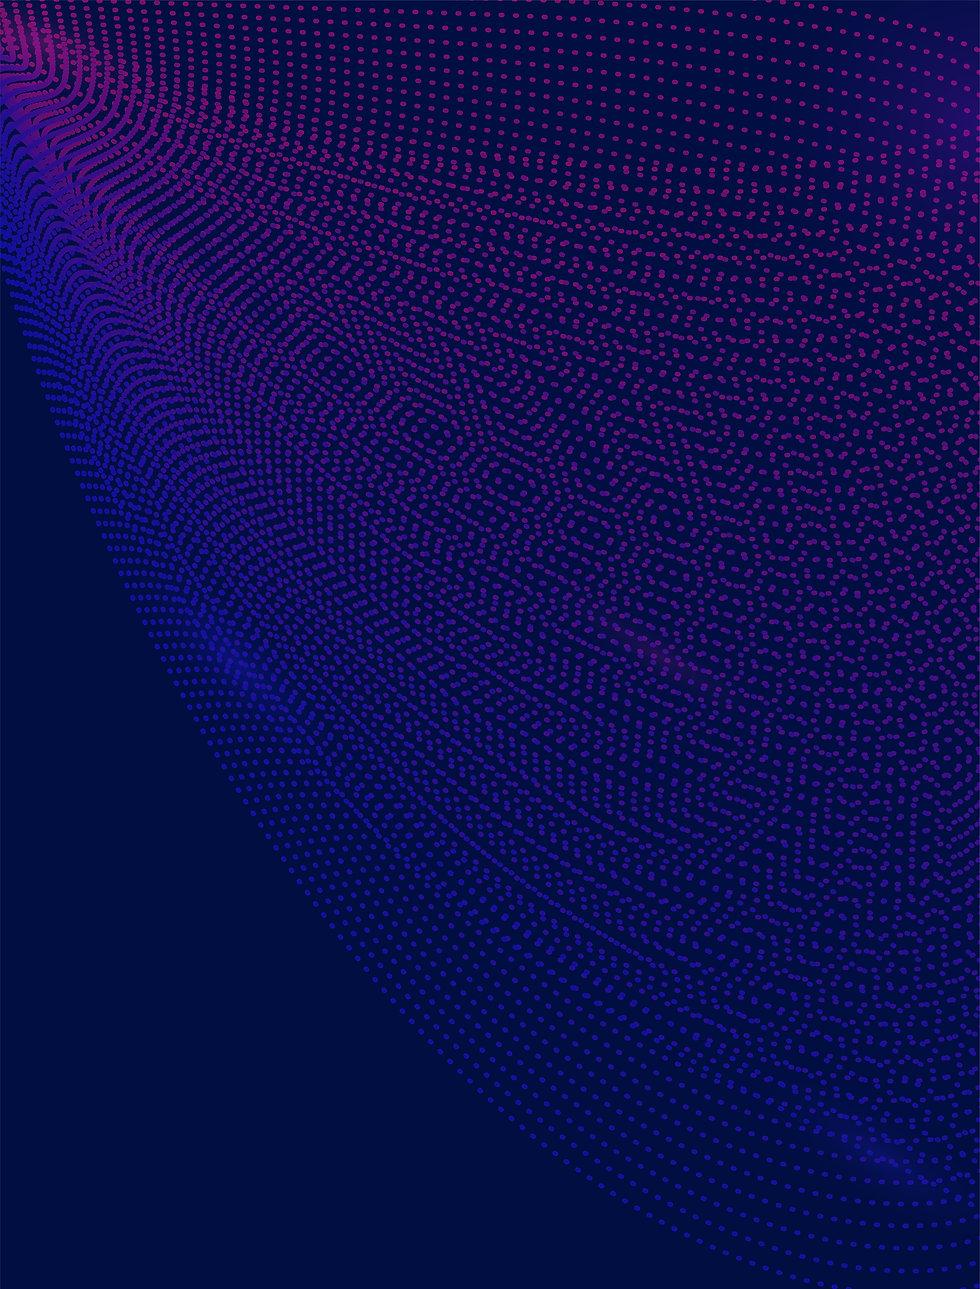 background-1.jpg